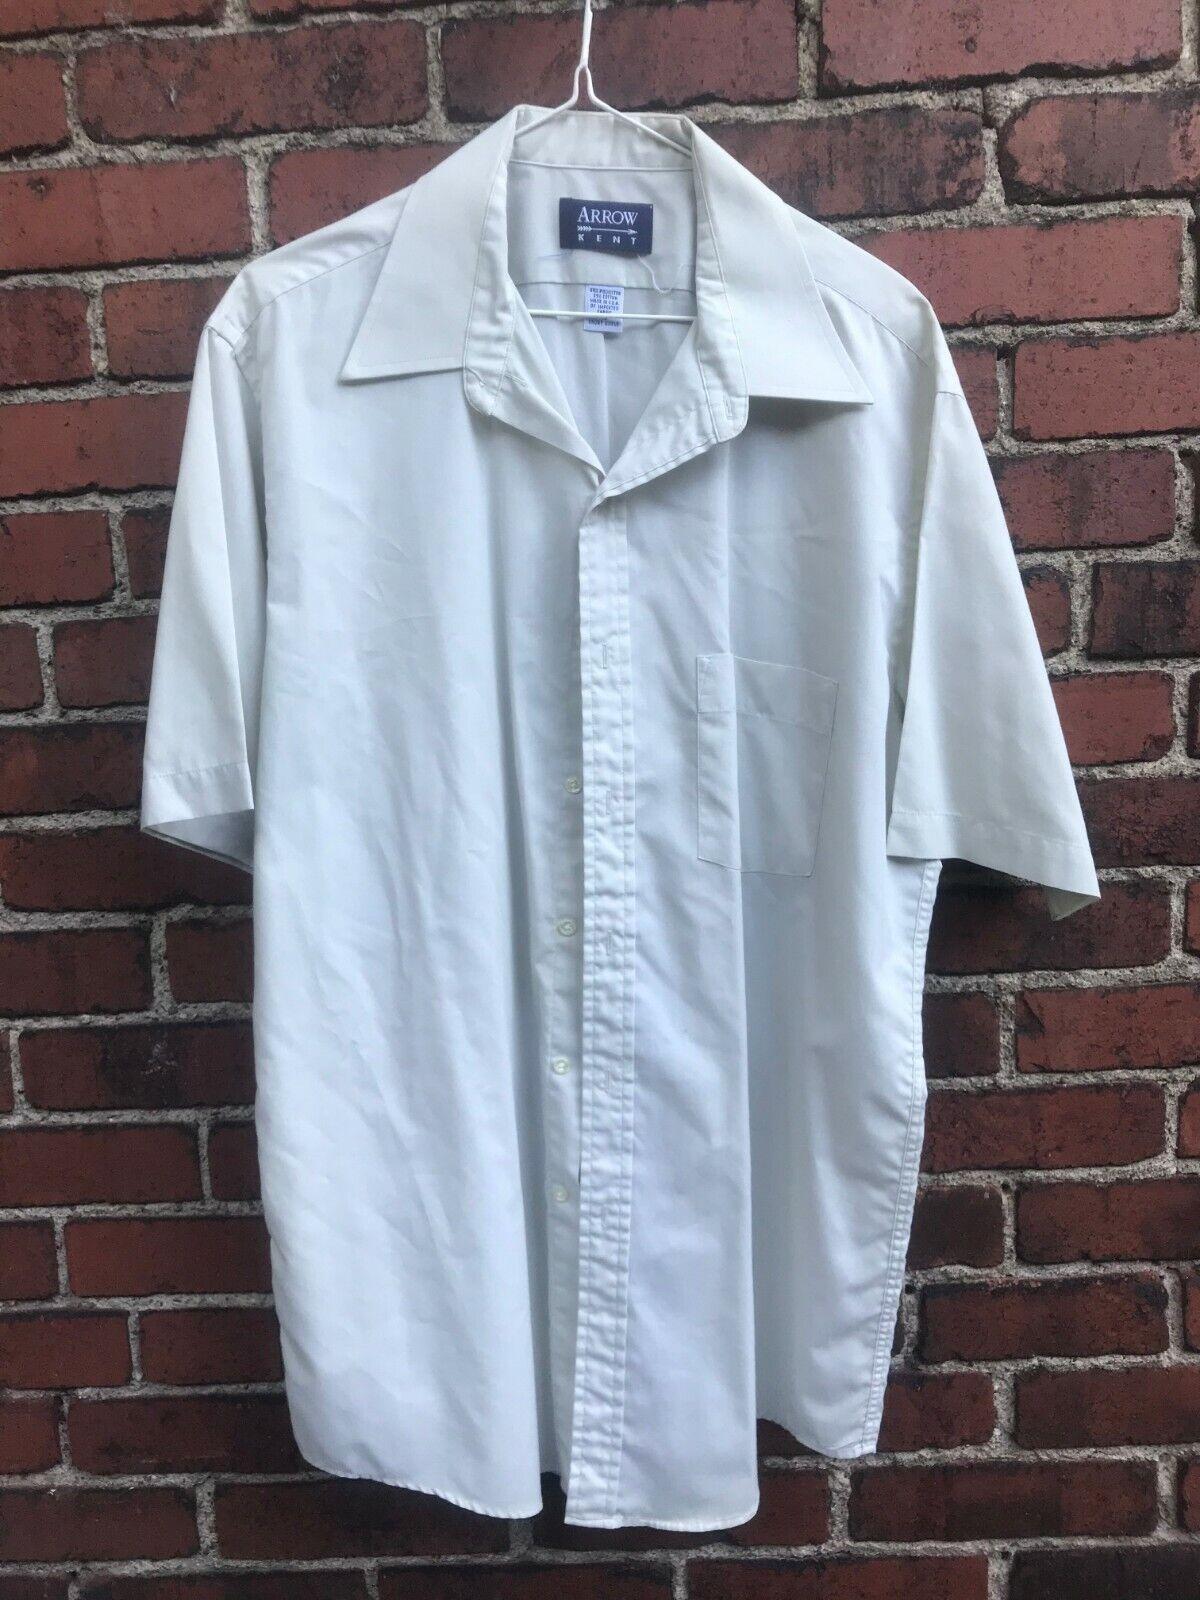 15 33 medium Deadstock Vintage Long Sleeve Shirt 60s Dress Shirt Vintage Mens Clothing Arrow Dectolene Made in USA